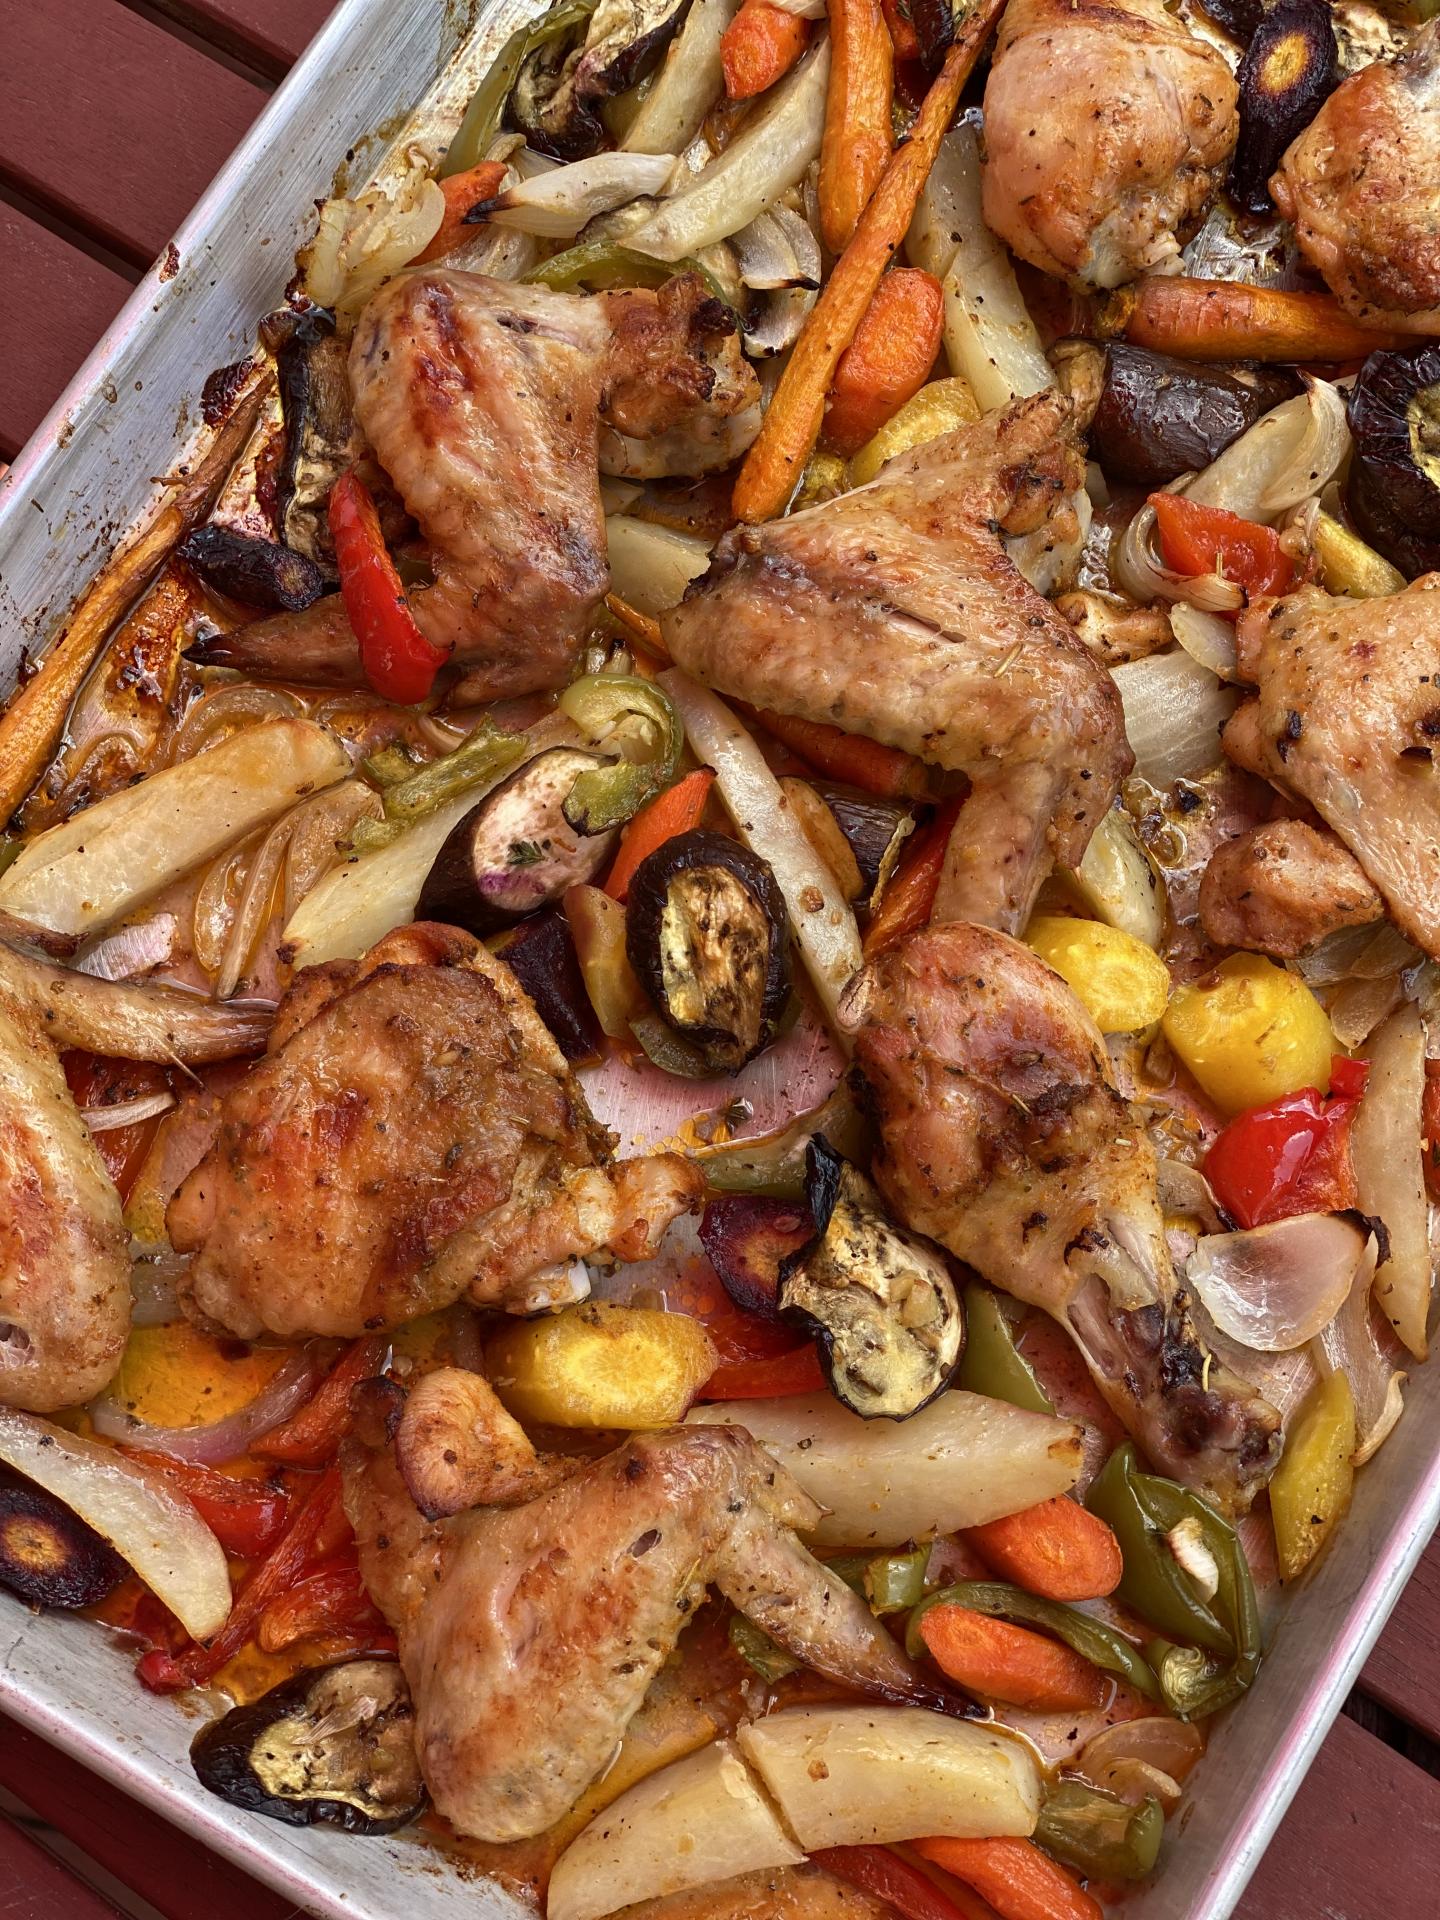 Sheet pan garden vegetables and chicken